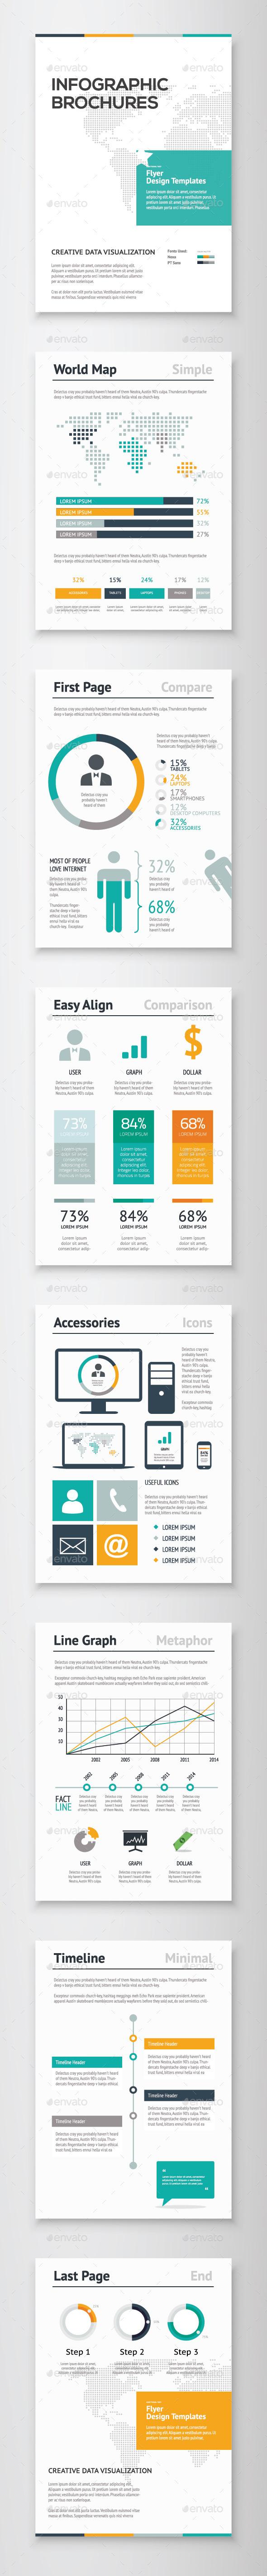 Infographic Brochure Vector Elements Kit 2 - Infographics